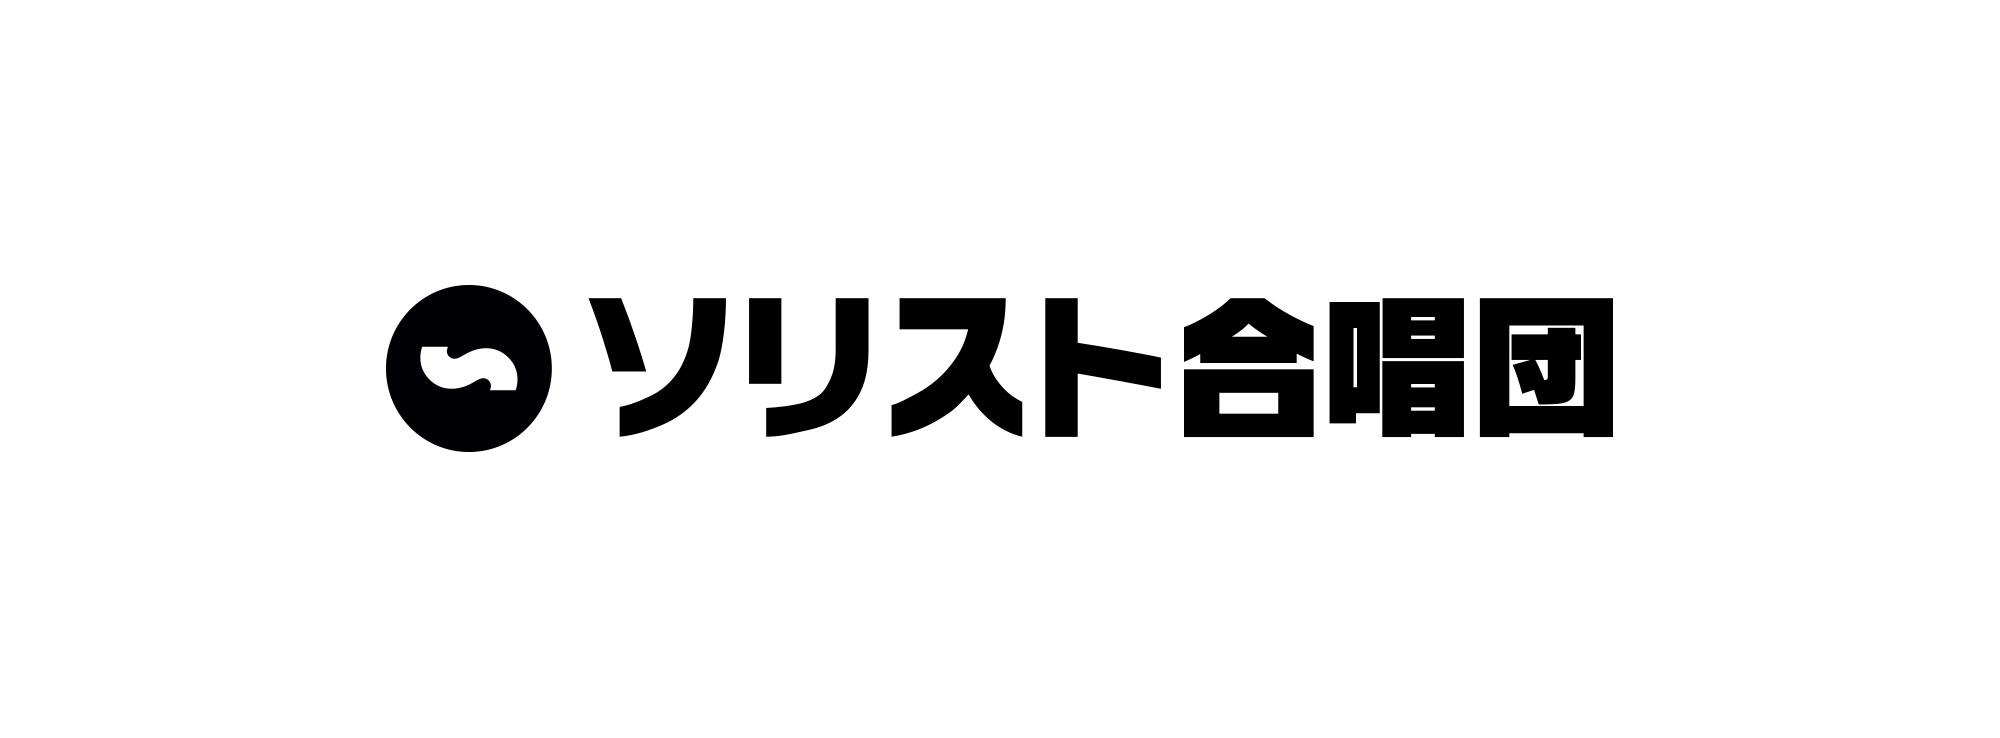 soloist_logo_jp2